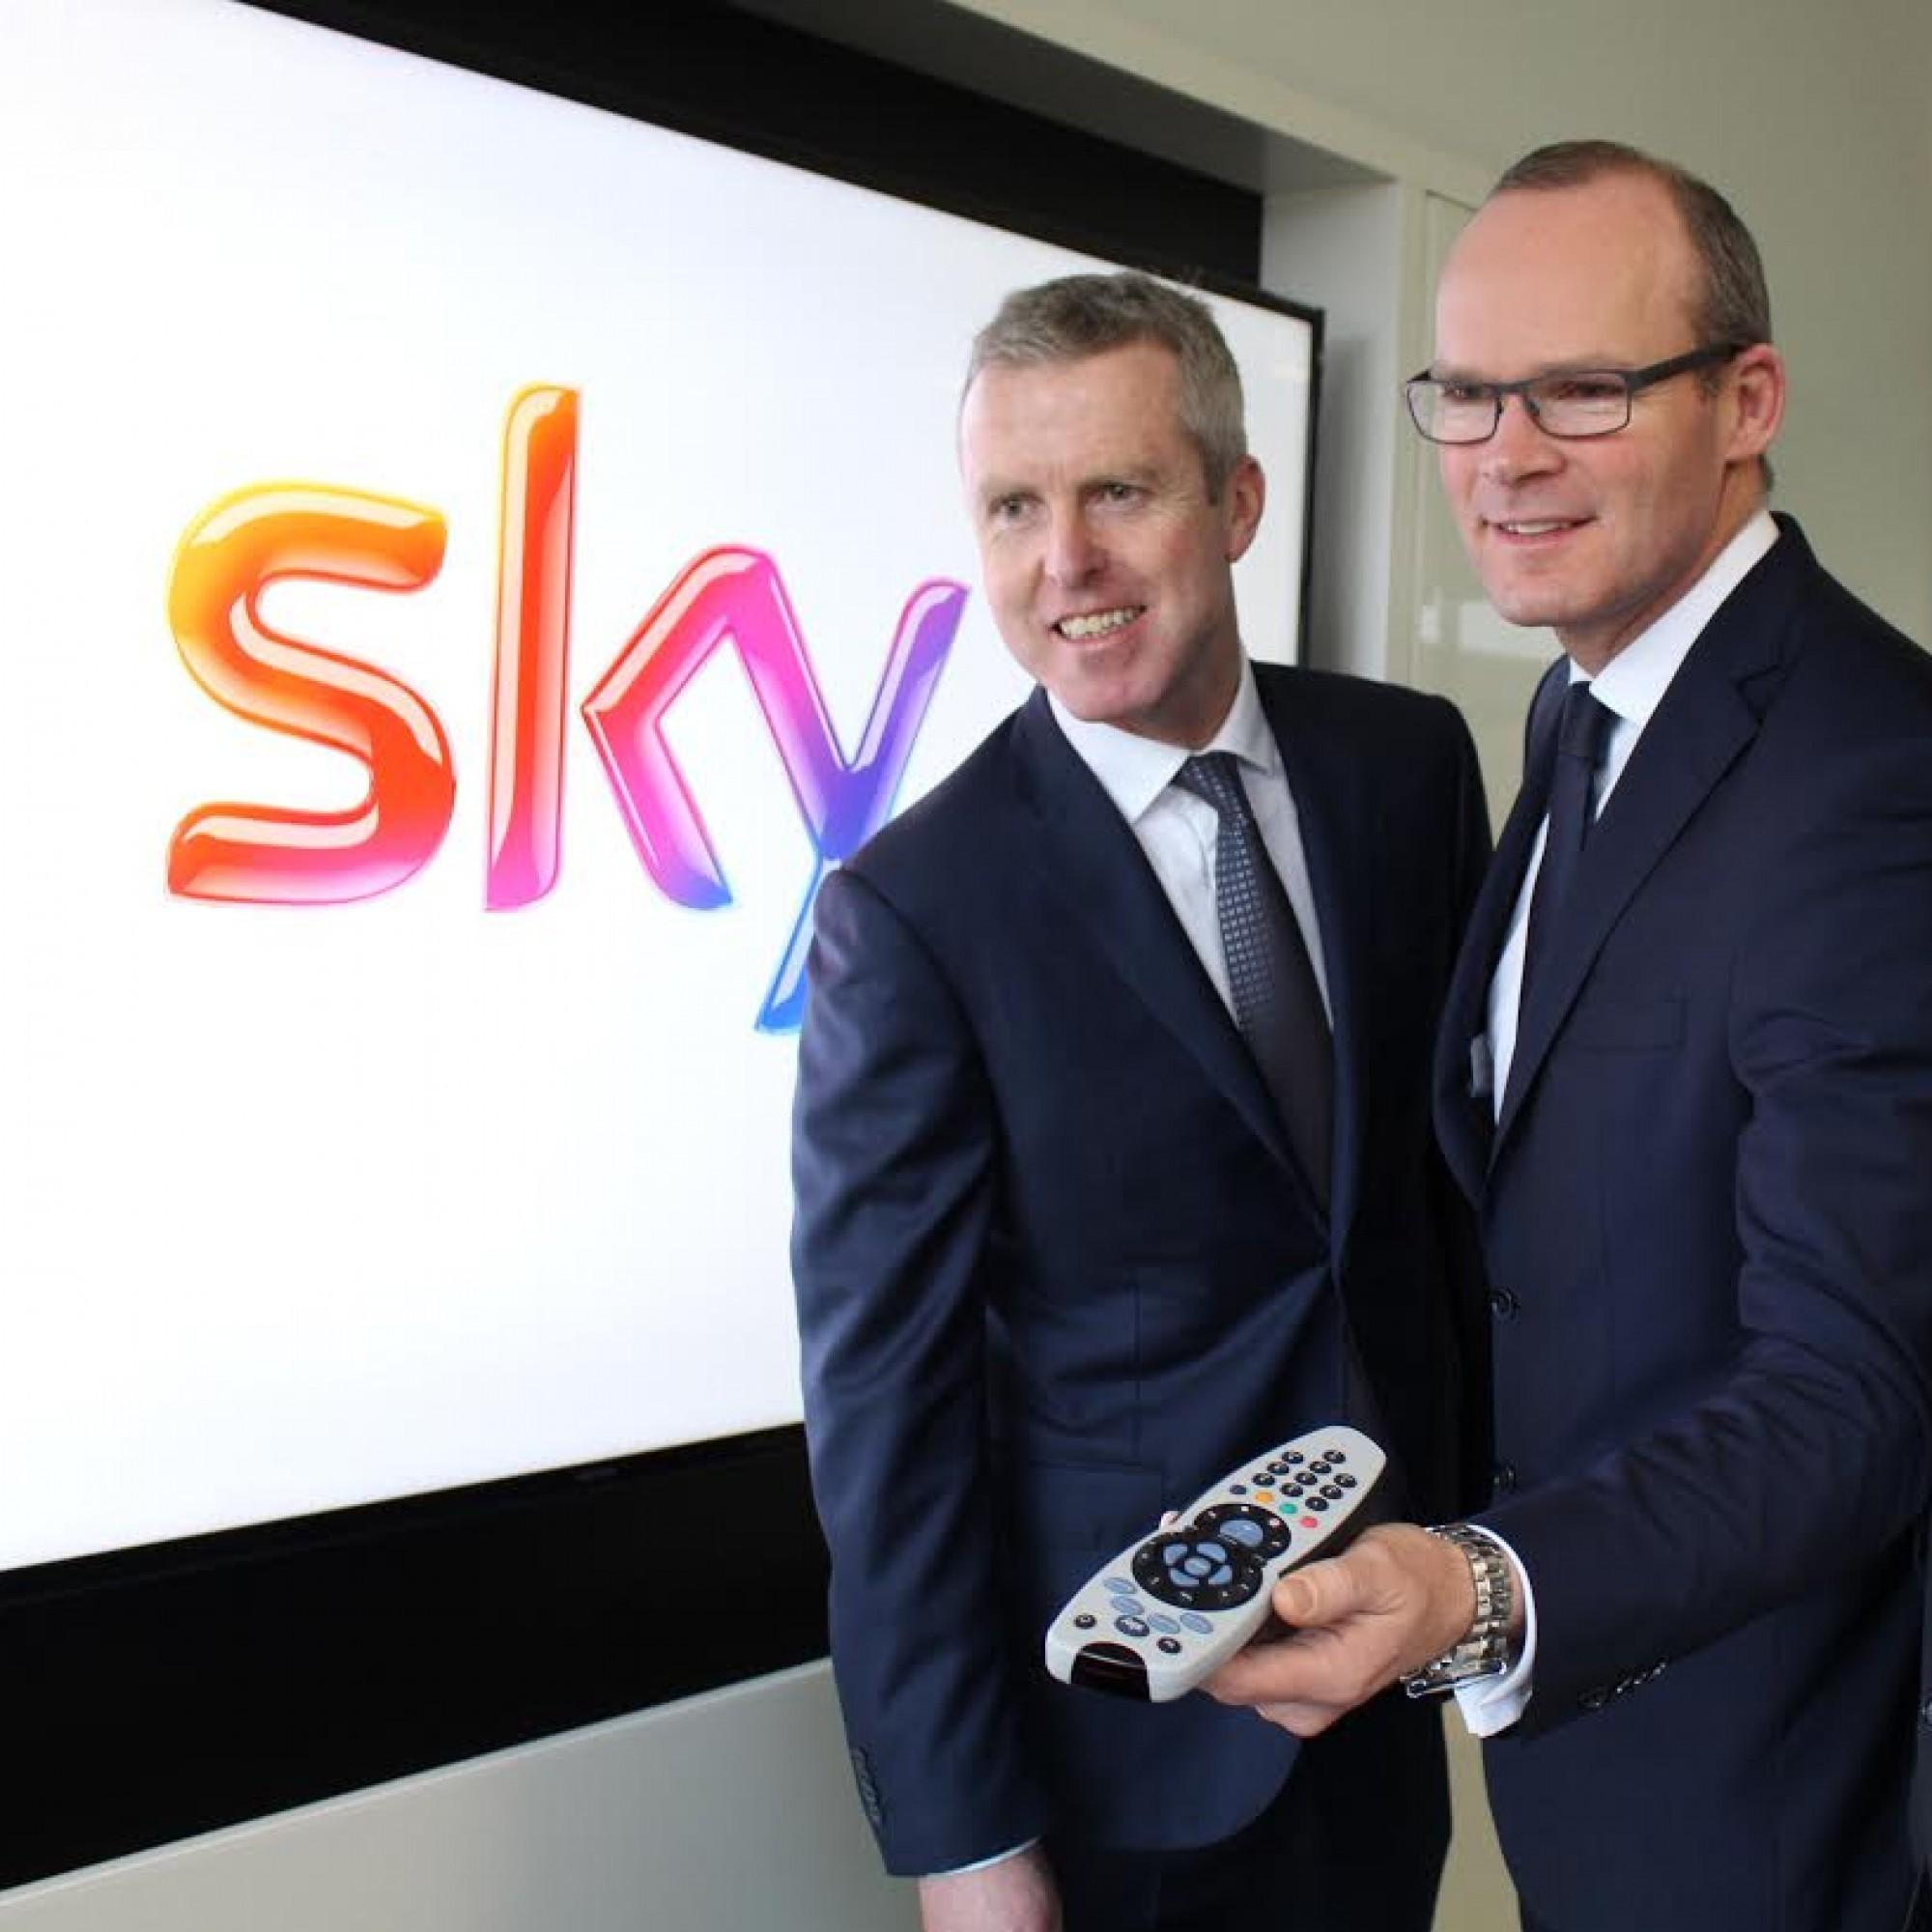 Irish Water call centre operator to handle customer service for Sky